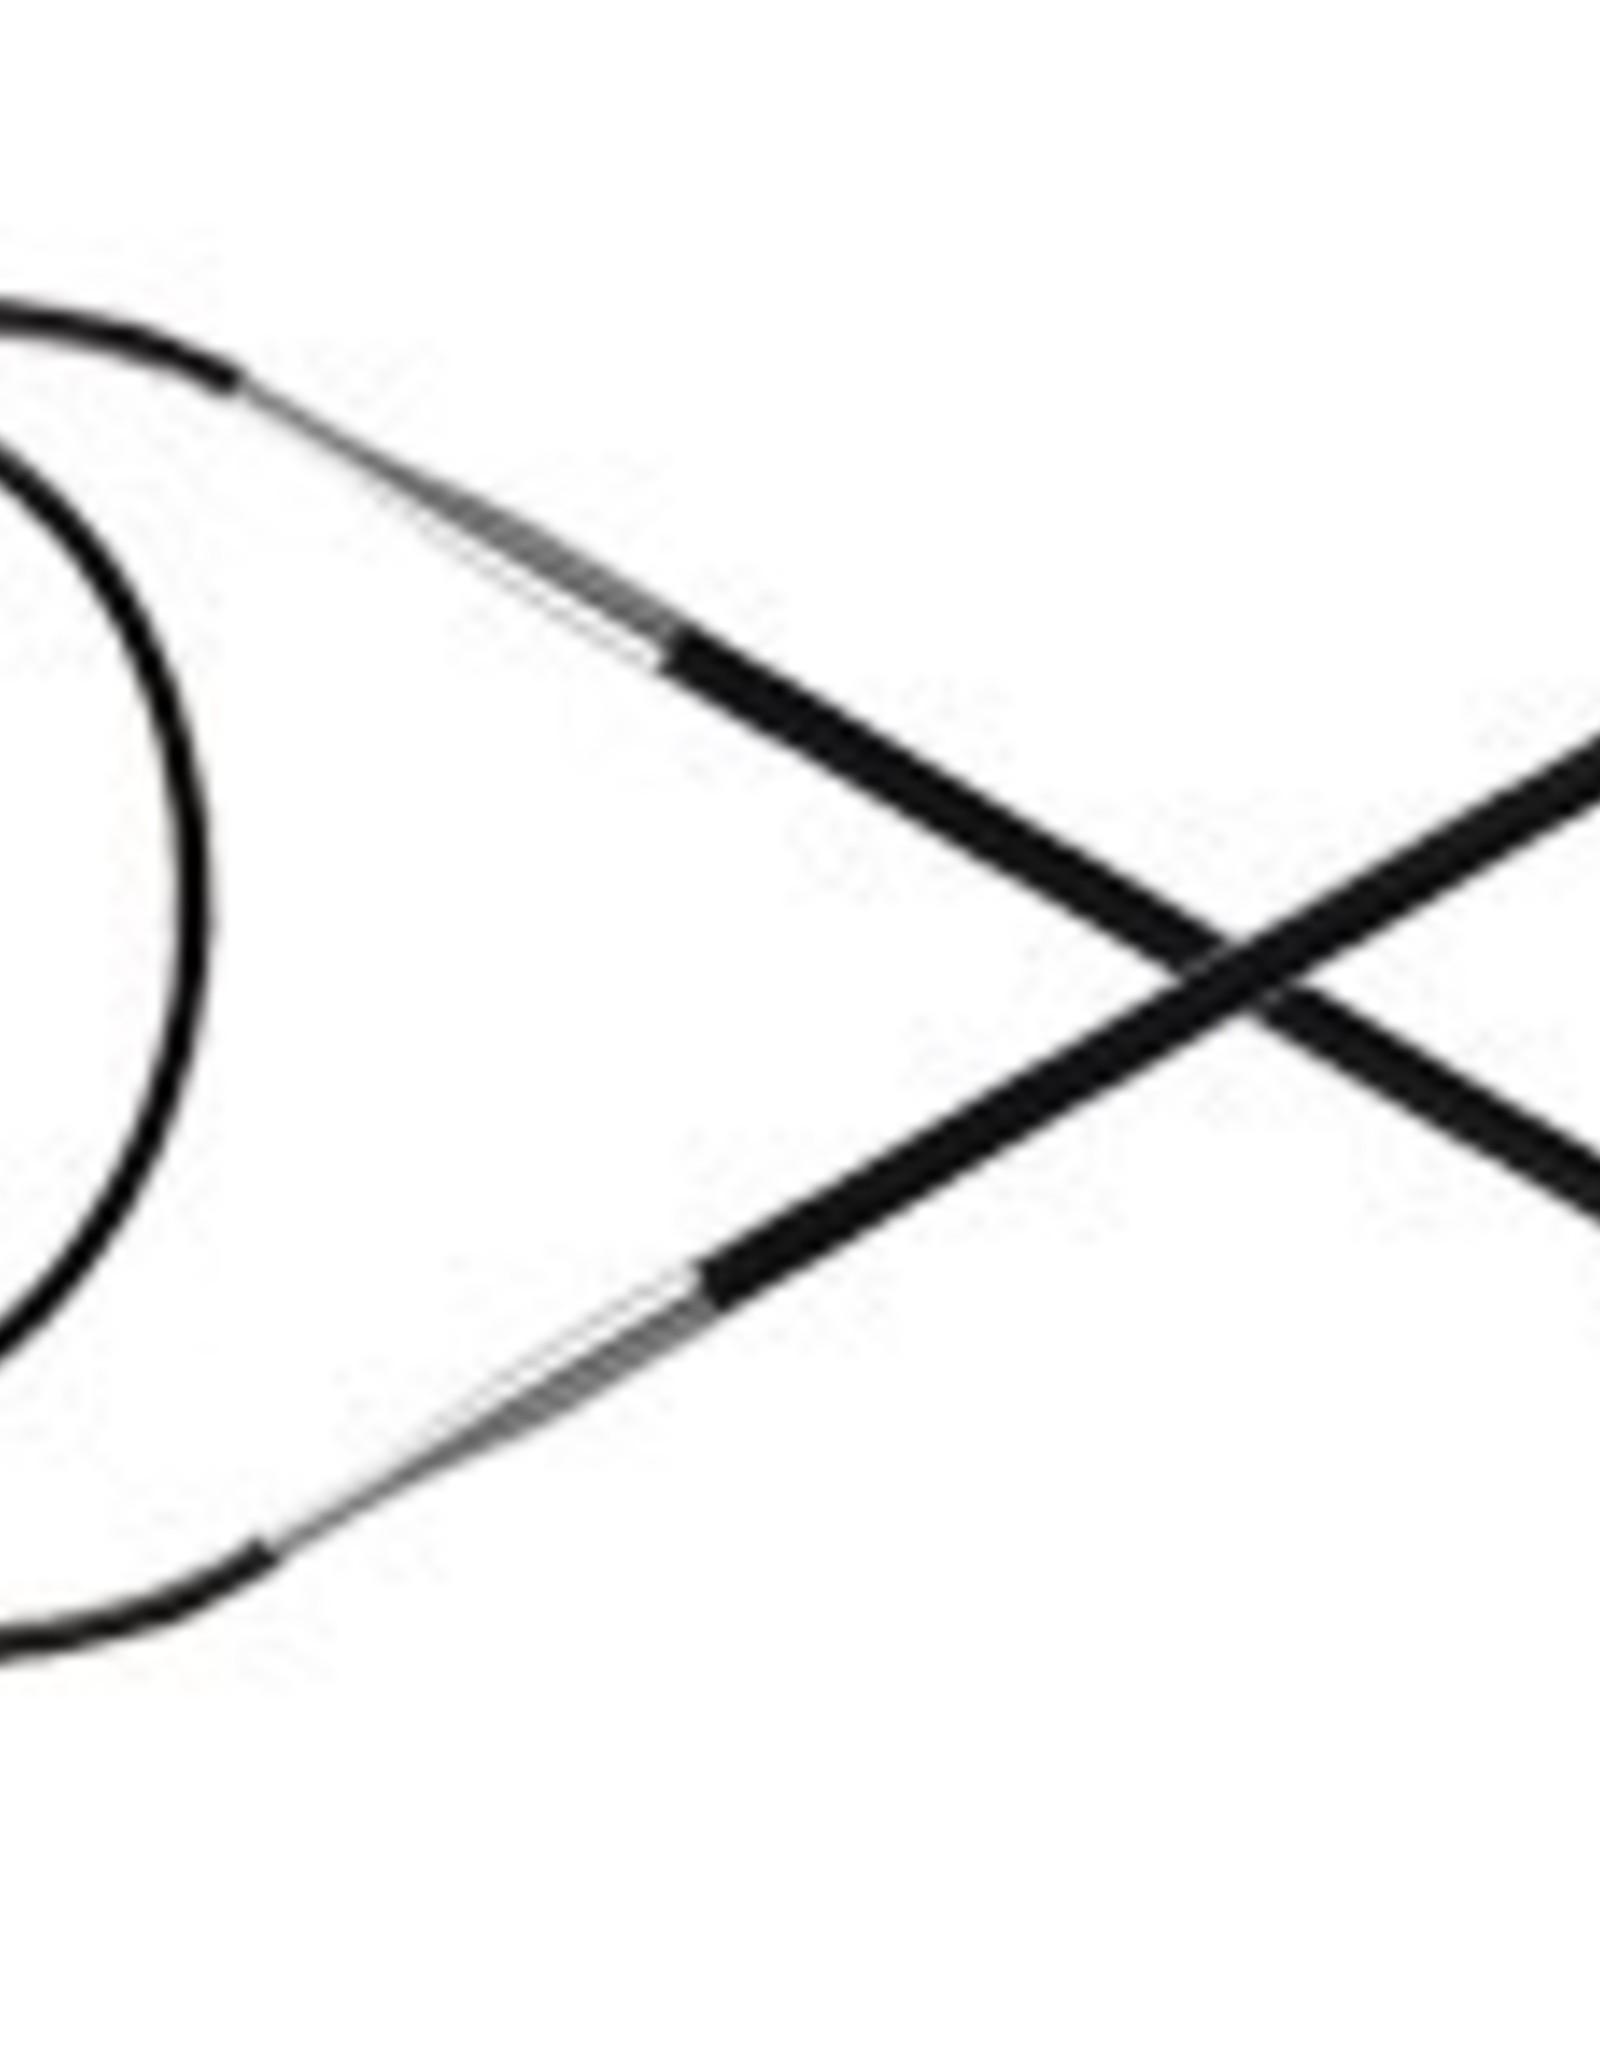 Knitter's Pride 3 Karbonz Circular 24